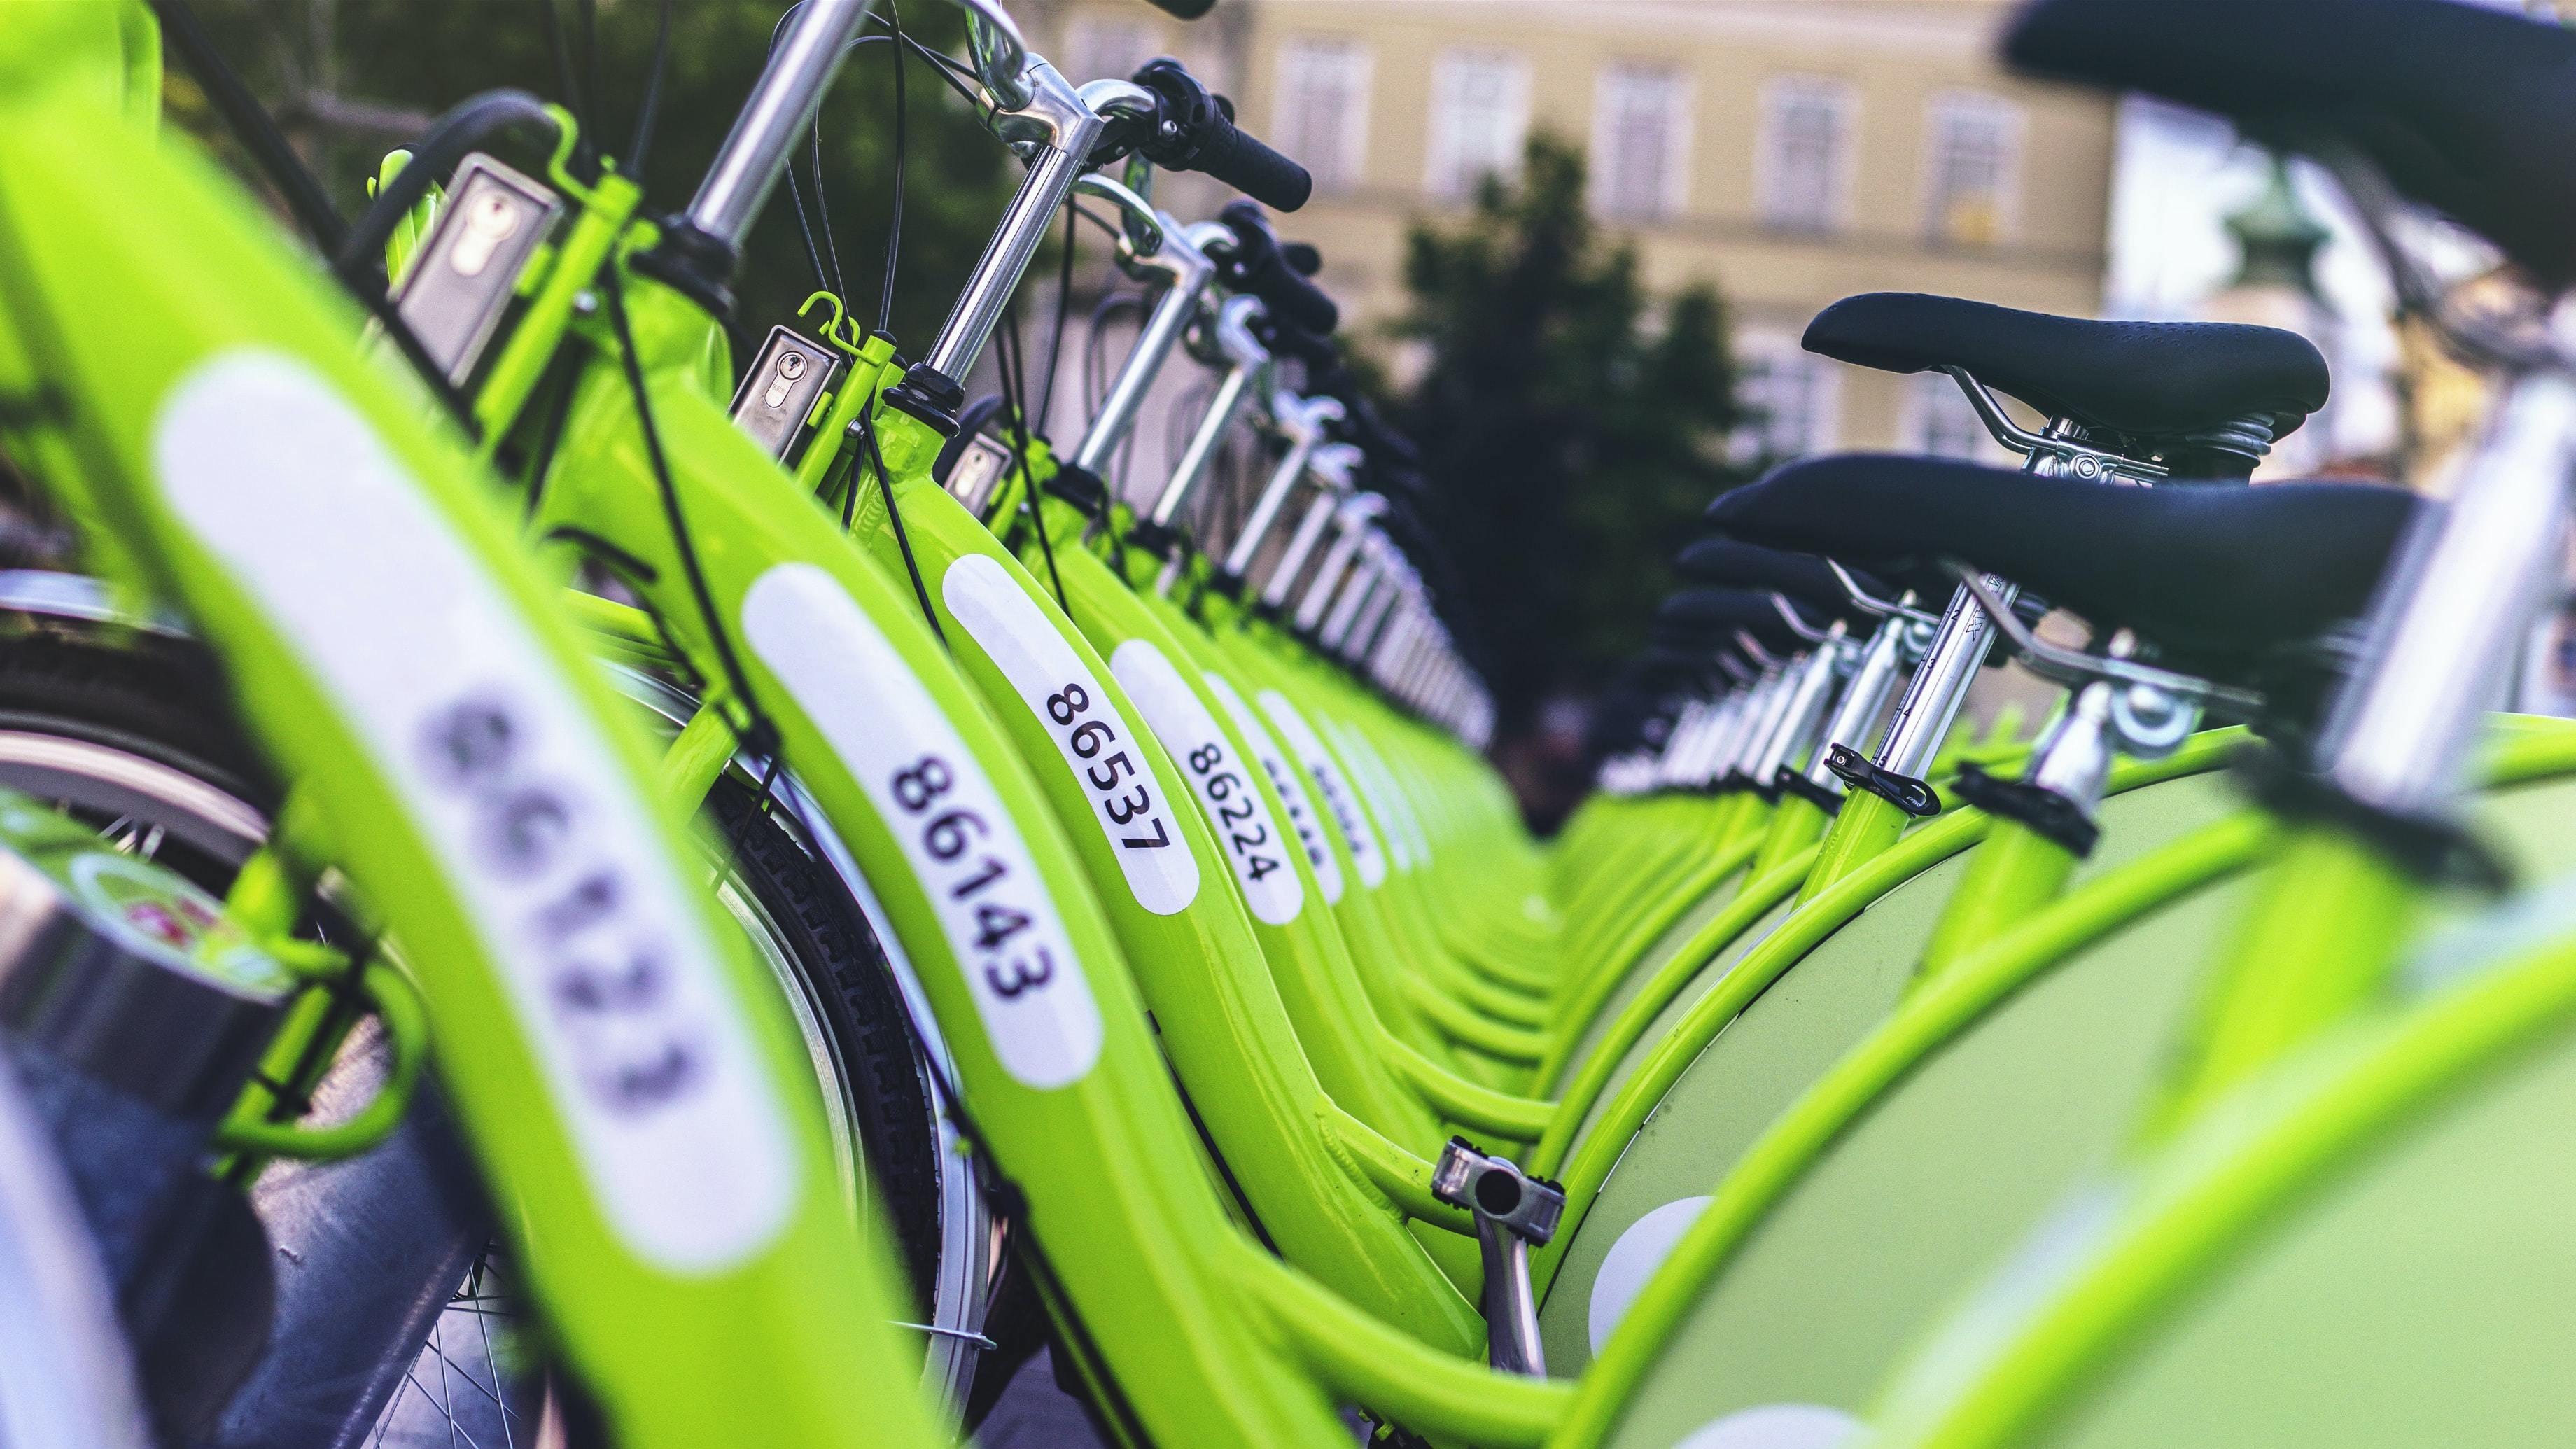 Row of green bikes.